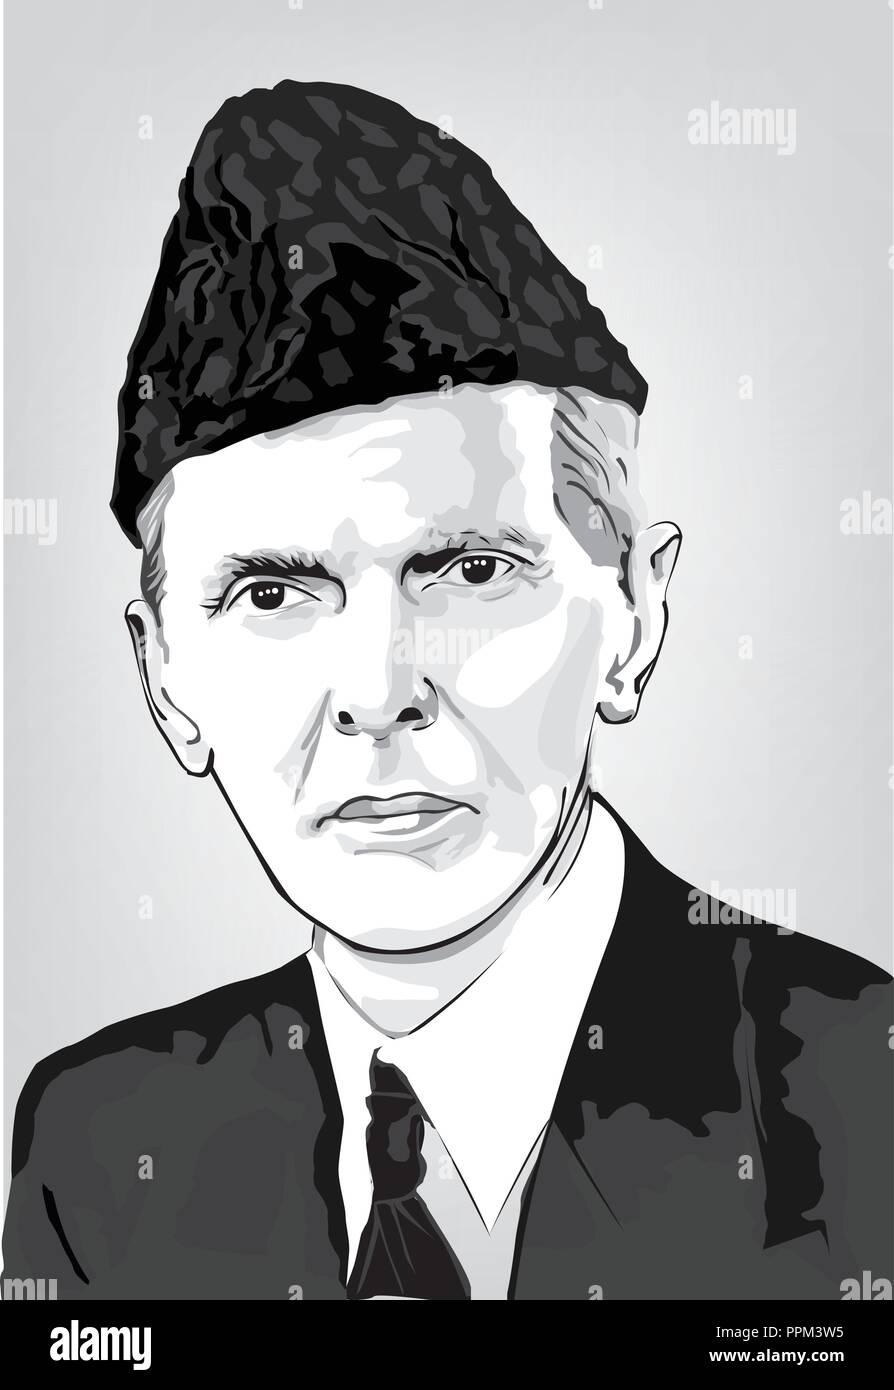 Jinnah vector illustration - Stock Image